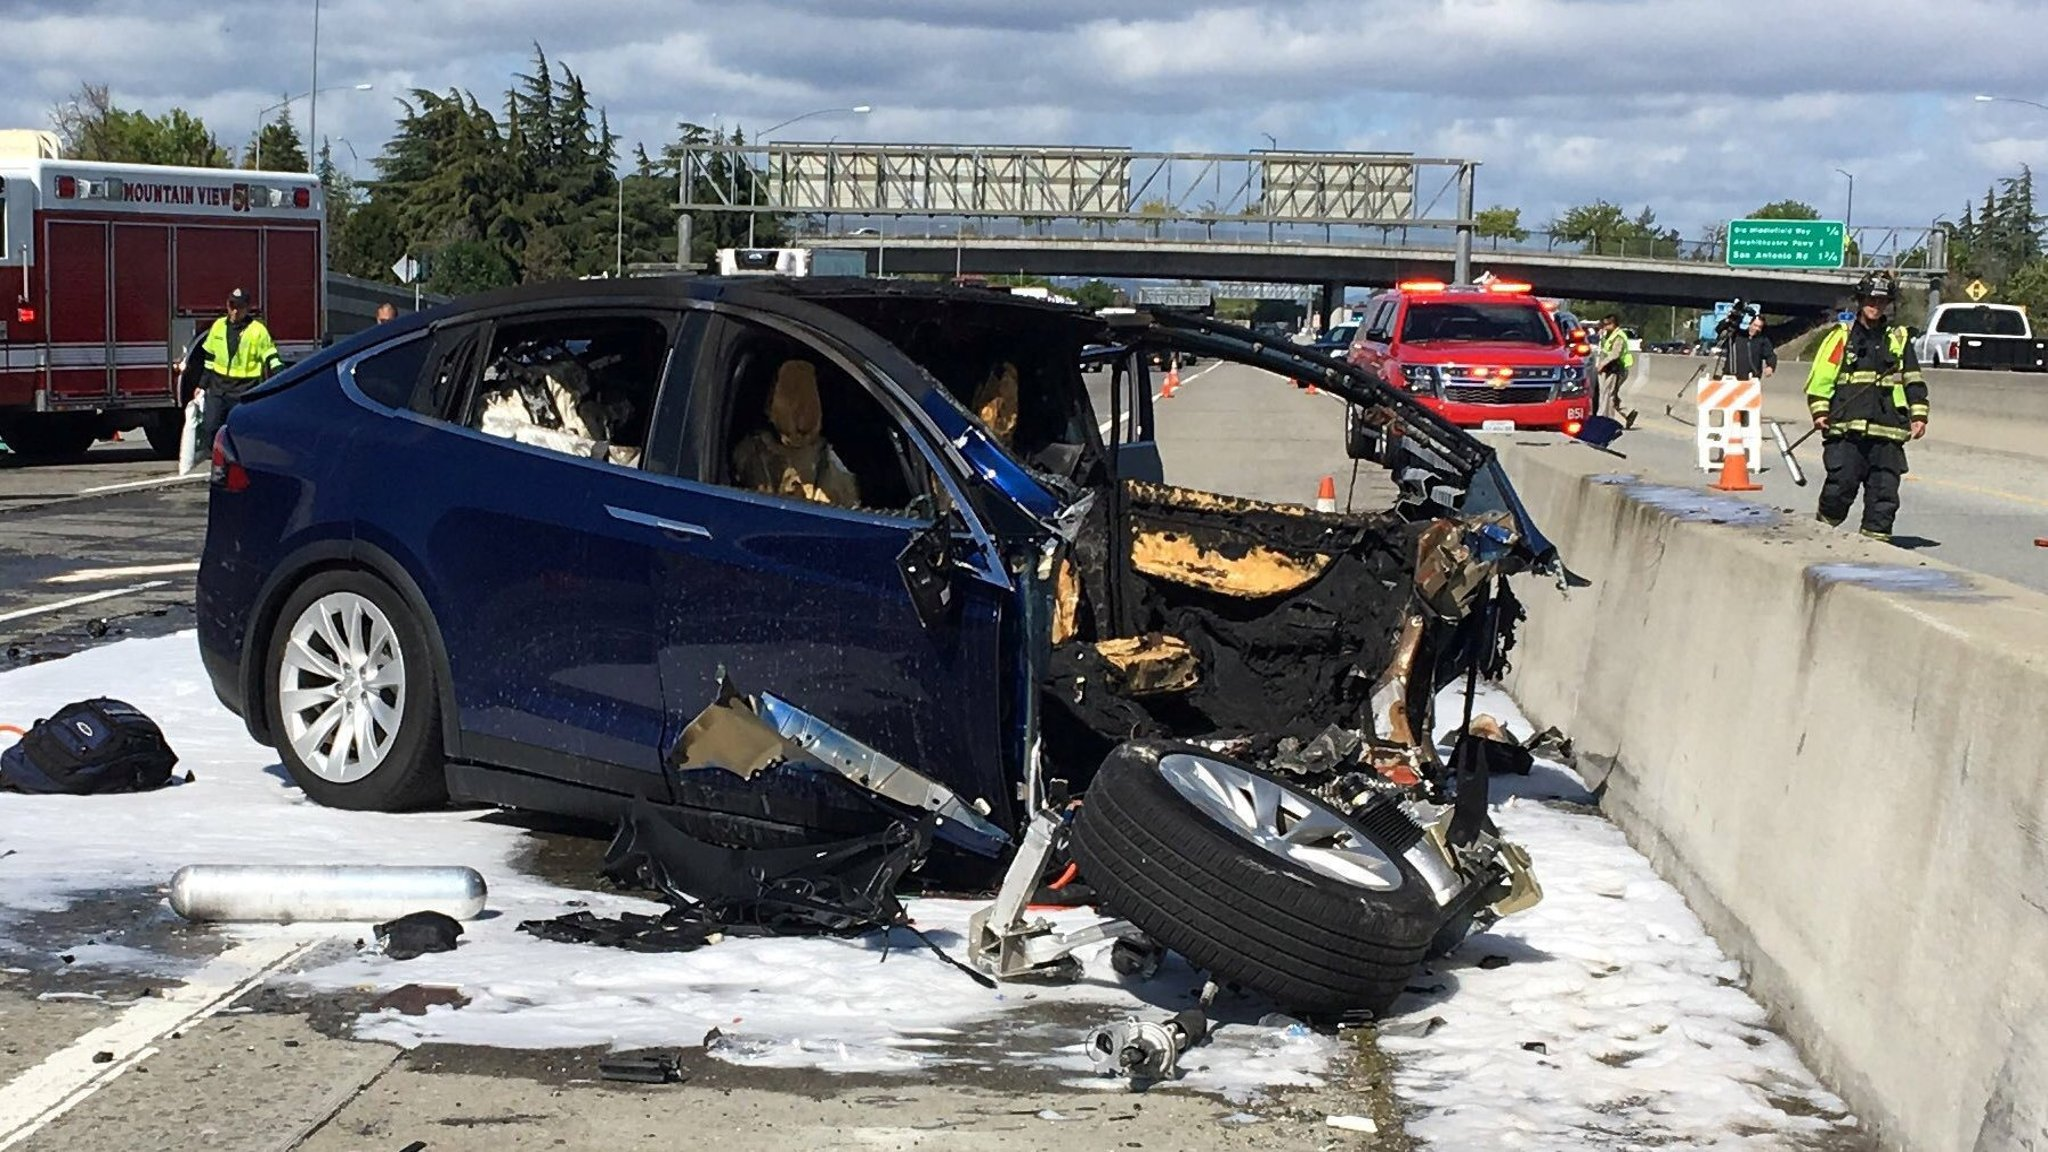 Tesla says crash car was running on autopilot | Financial Times